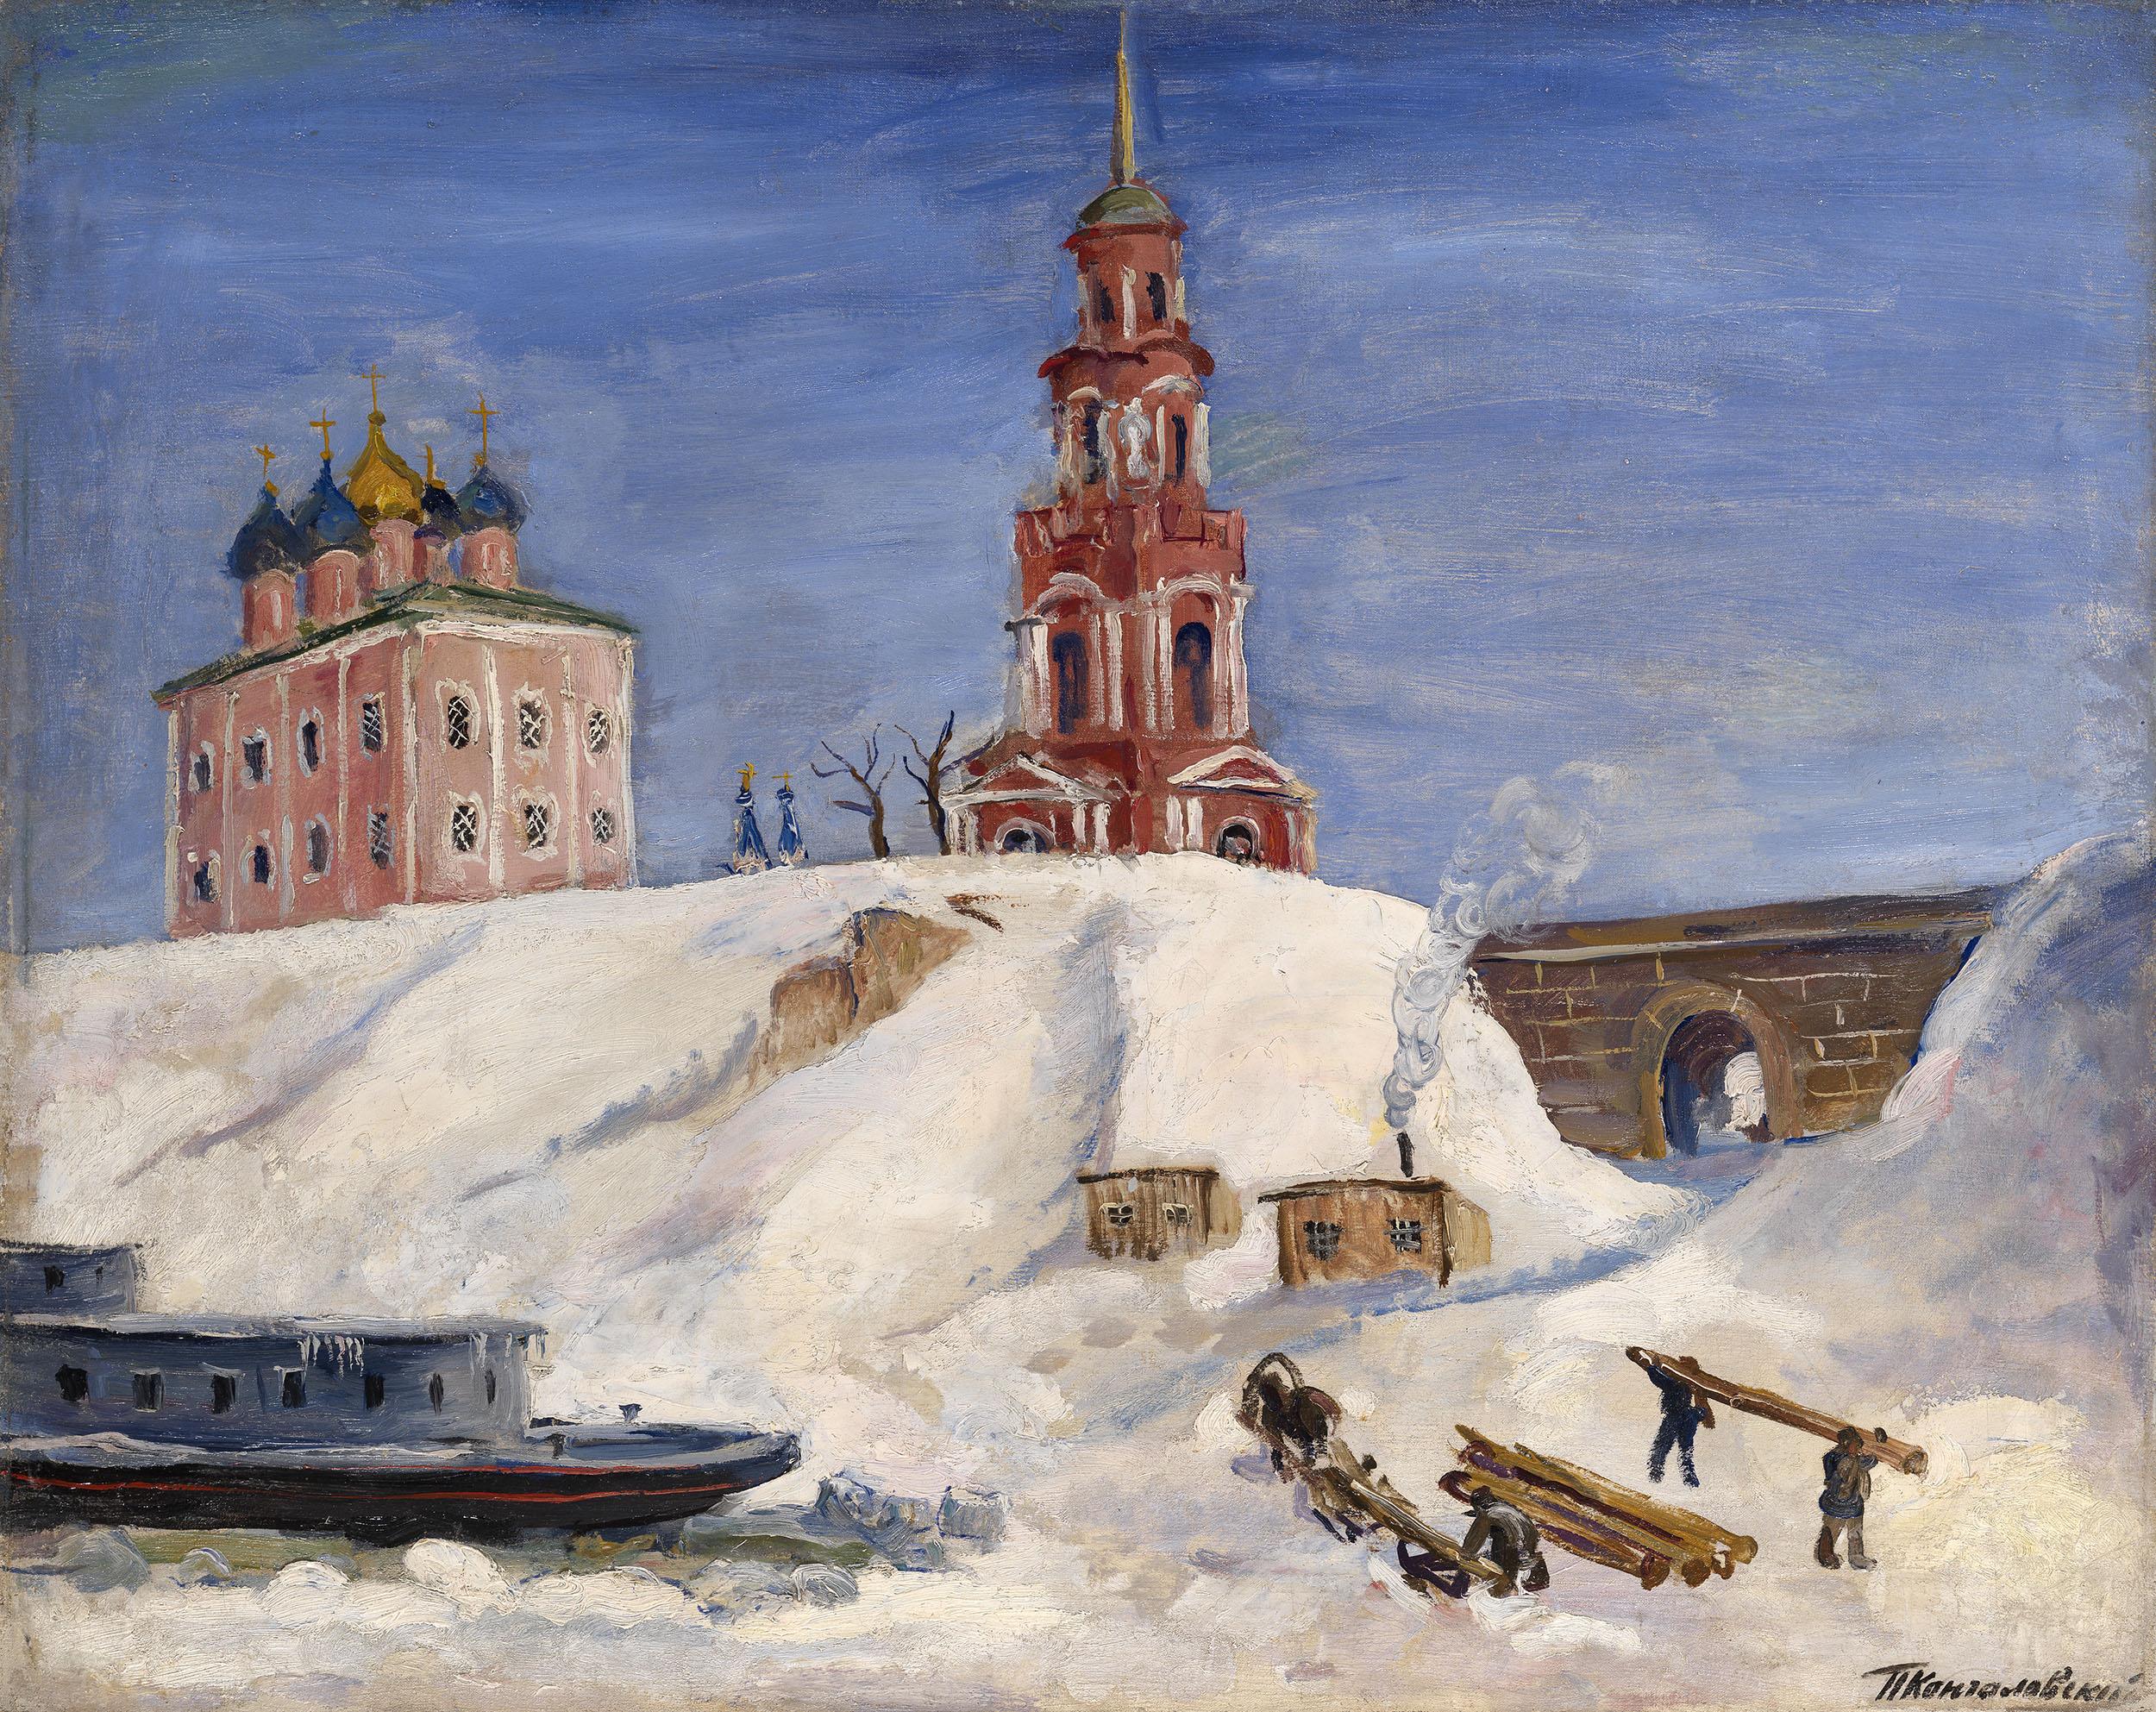 KONCHALOVSKY, PETR Pier at Ryazan